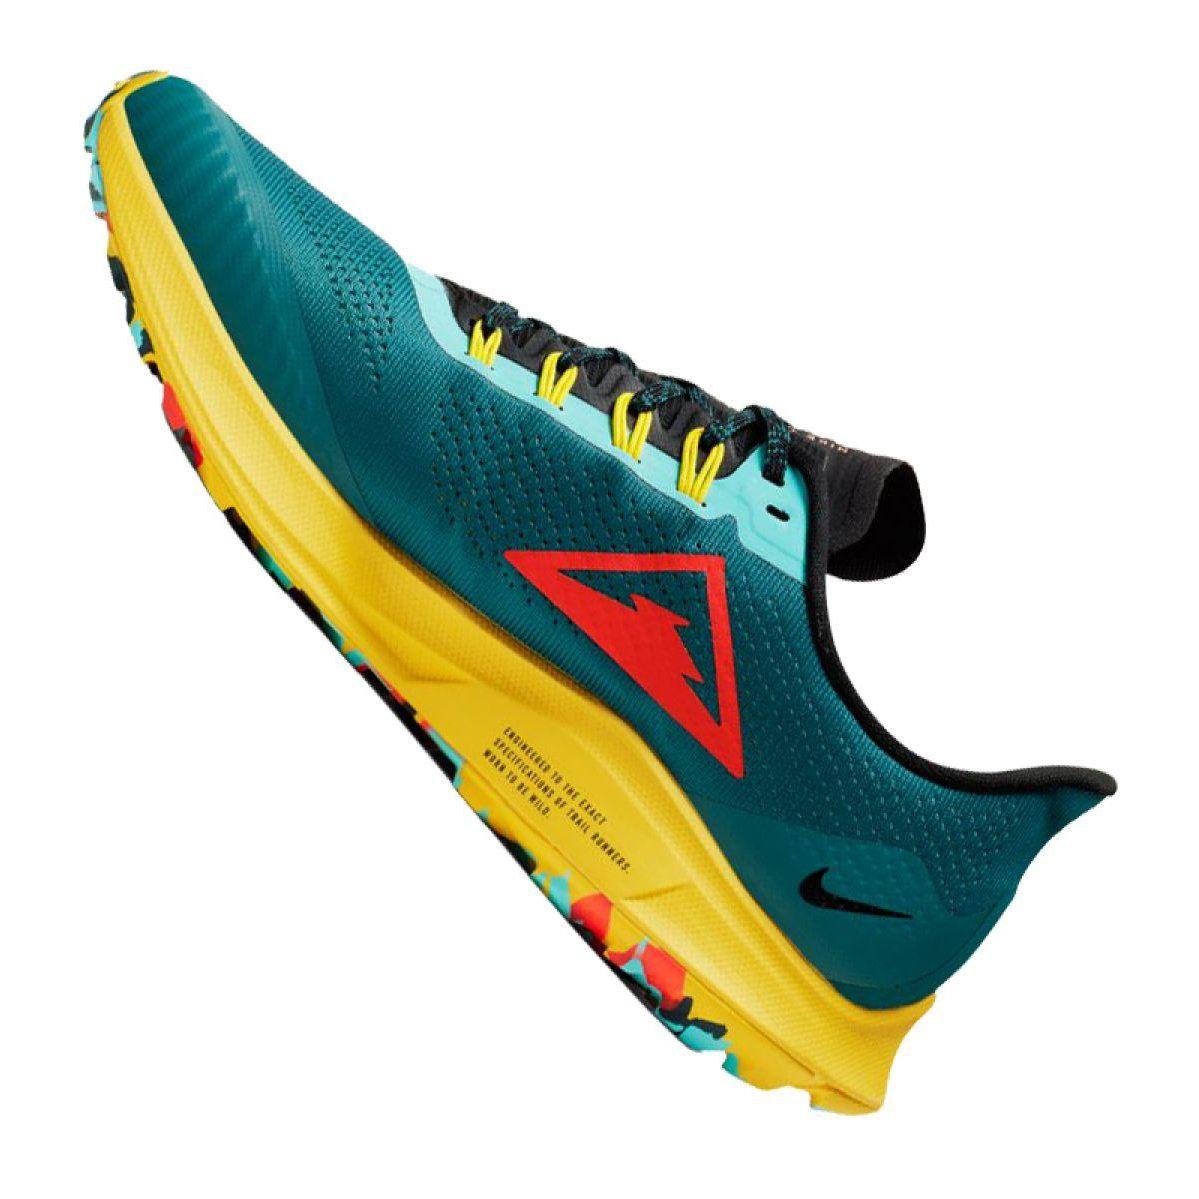 Buty Nike Air Zoom Pegasus 36 Trail M Ar5677 301 Niebieskie Wielokolorowe Nike Air Zoom Pegasus Nike Air Zoom Nike Air